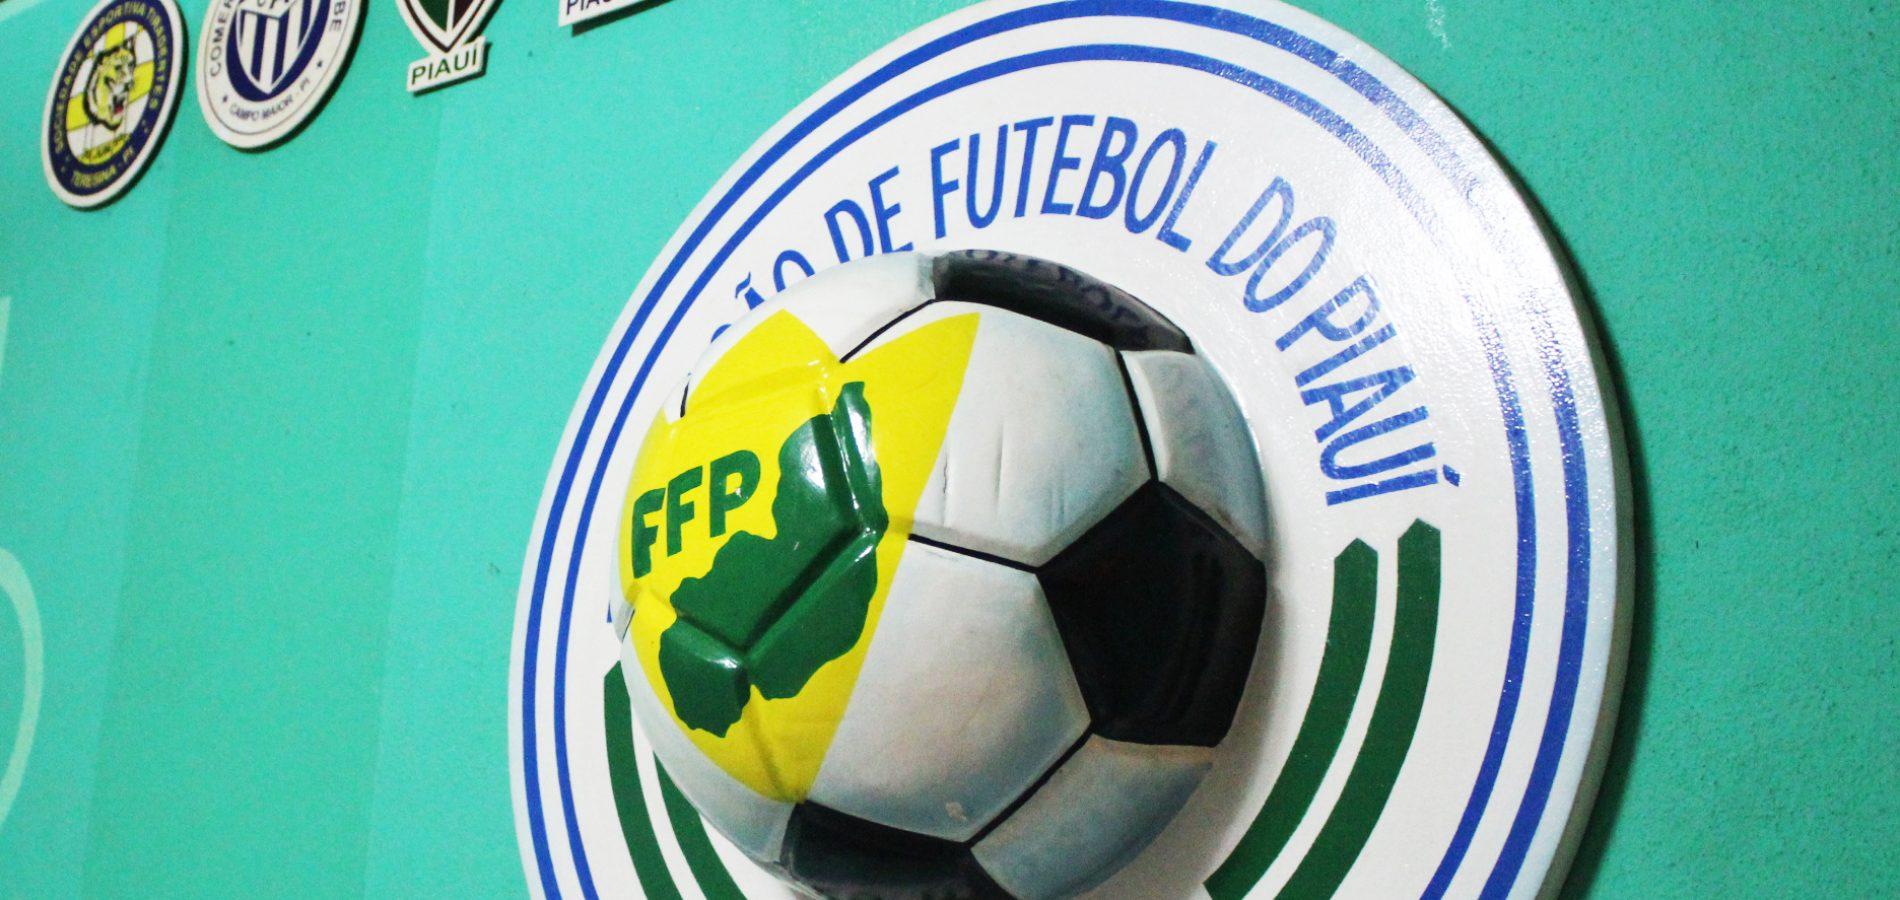 FFP divulga regulamento específico do Campeonato Piauiense Sub-17